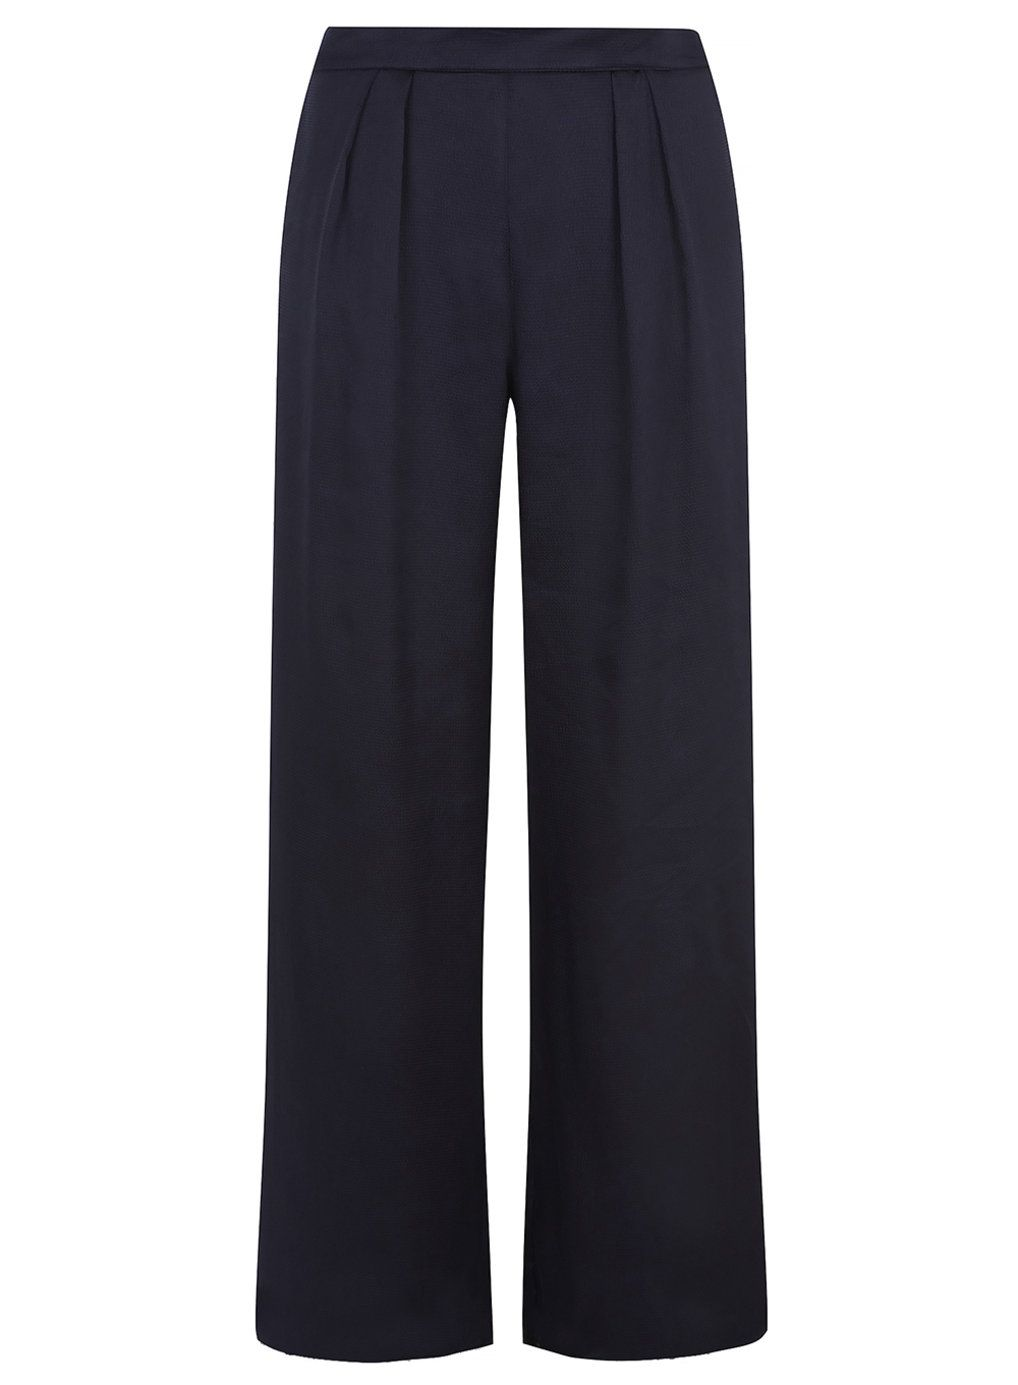 b2885dc18ee Navy satin palazzo trousers - Dorothy Perkins | My Style | Palazzo ...